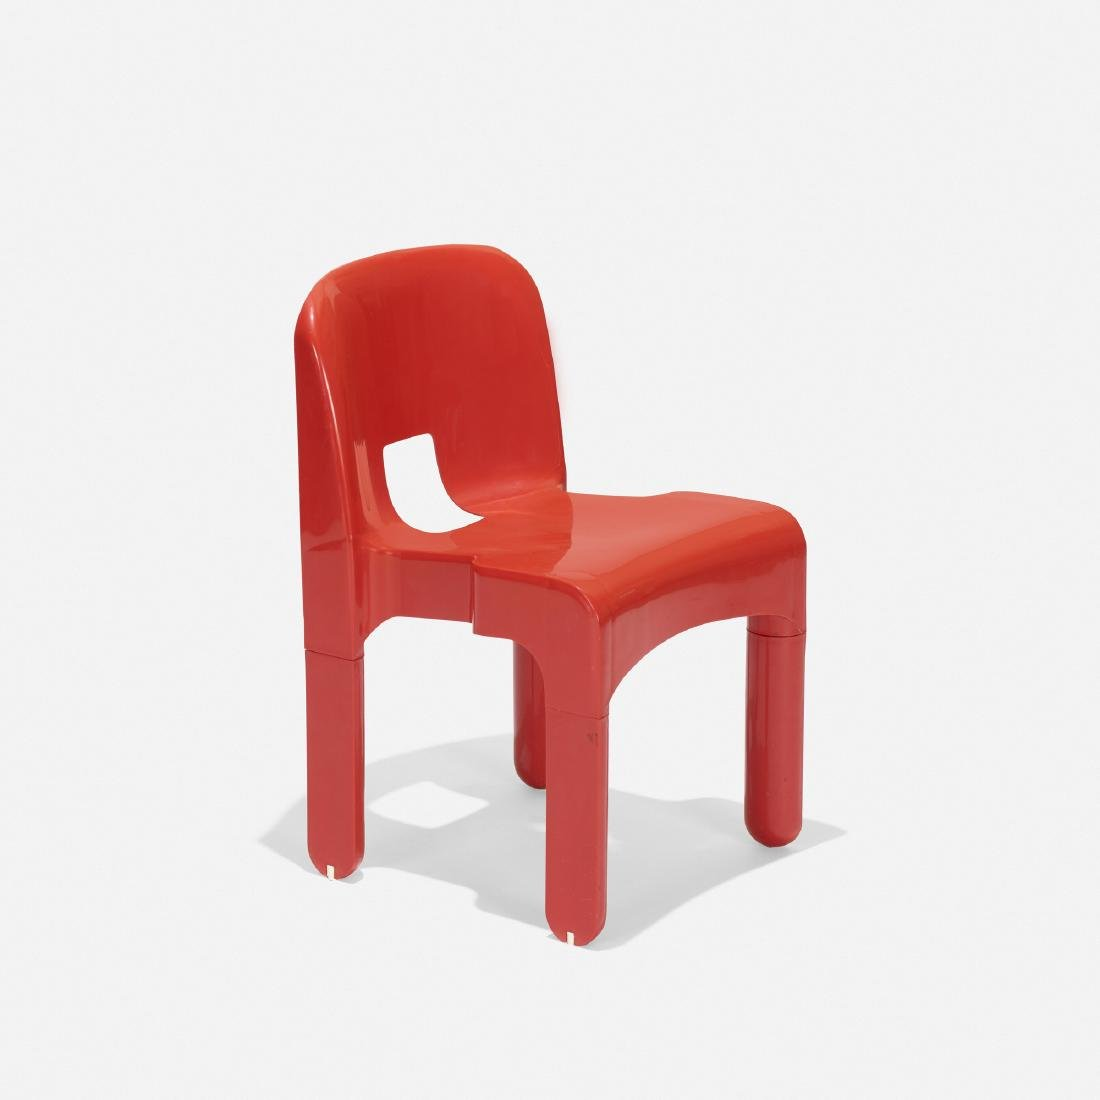 Joe Colombo, Universale chair, model 4867